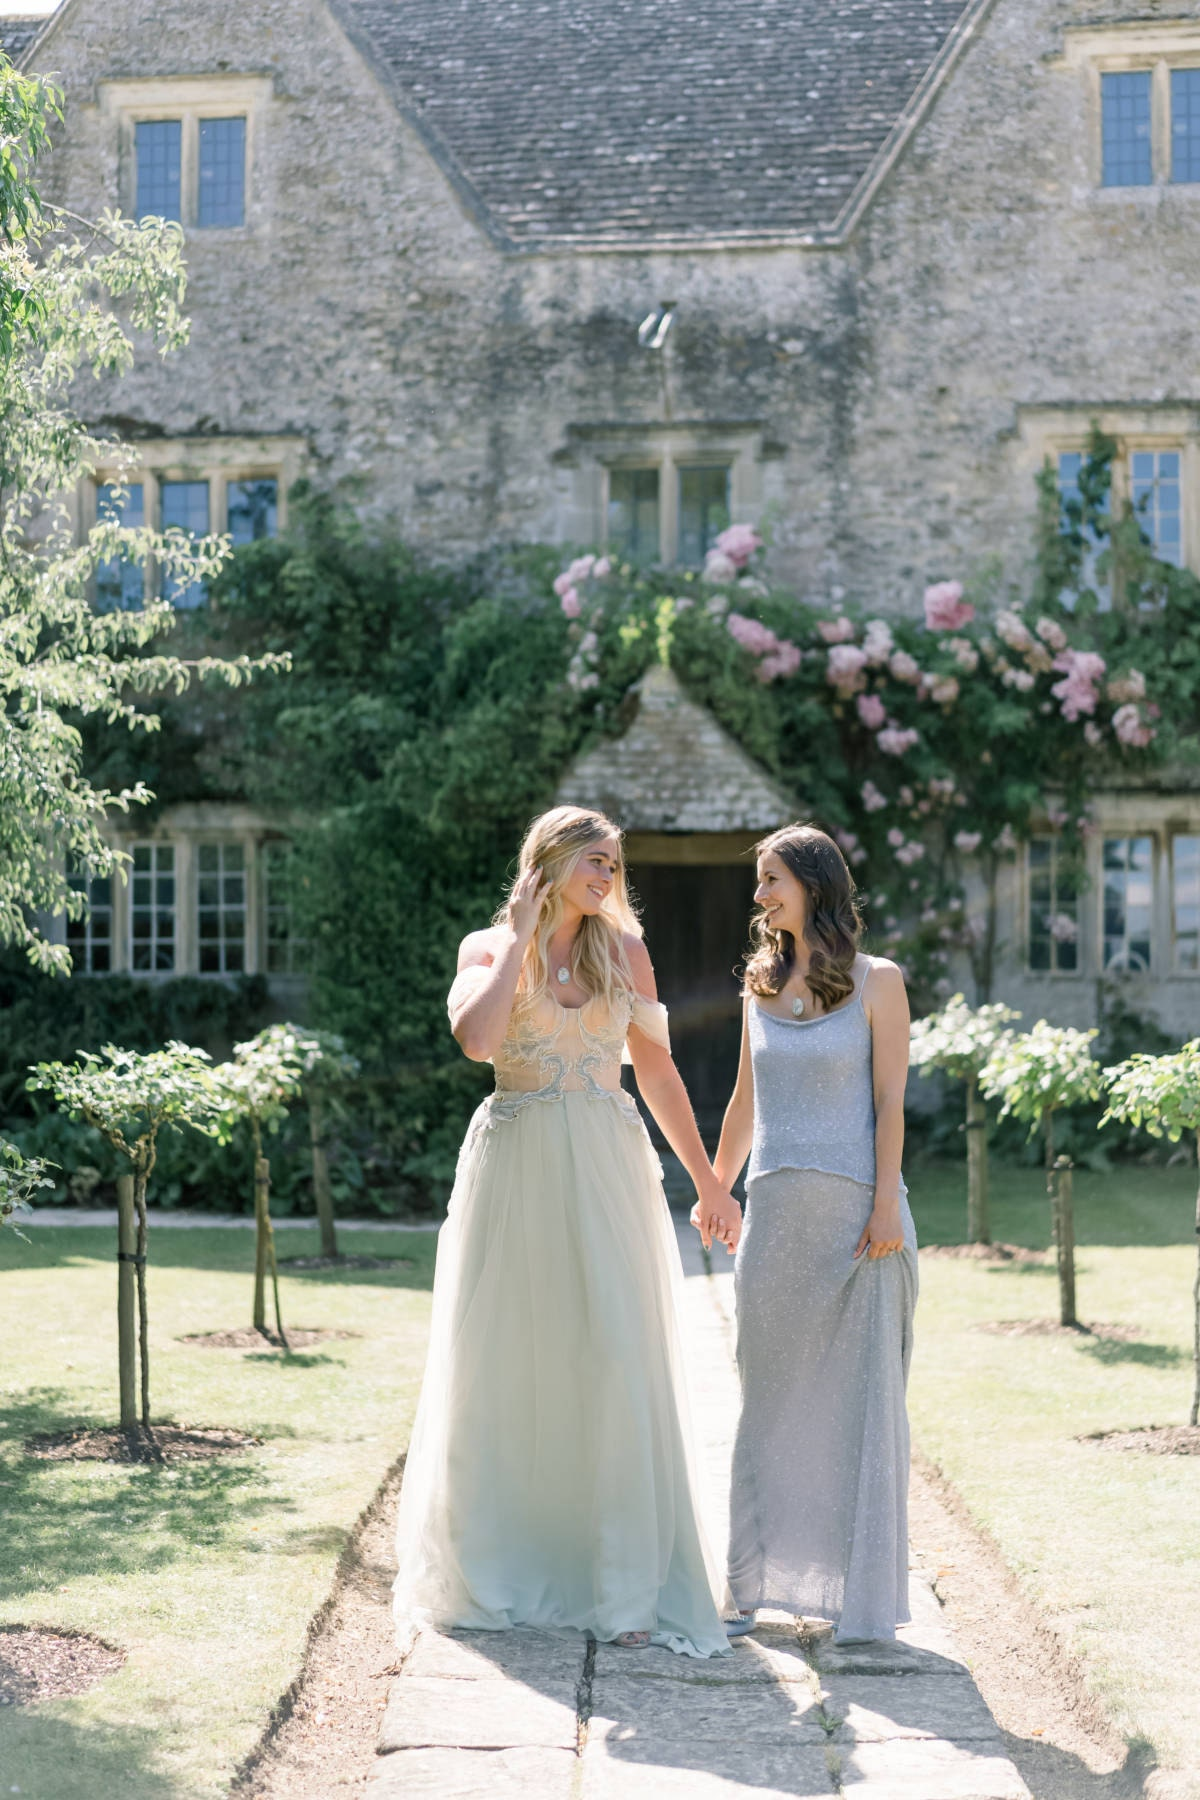 Bride & Bridesmaid wearing custom wedding dress fabric necklaces.